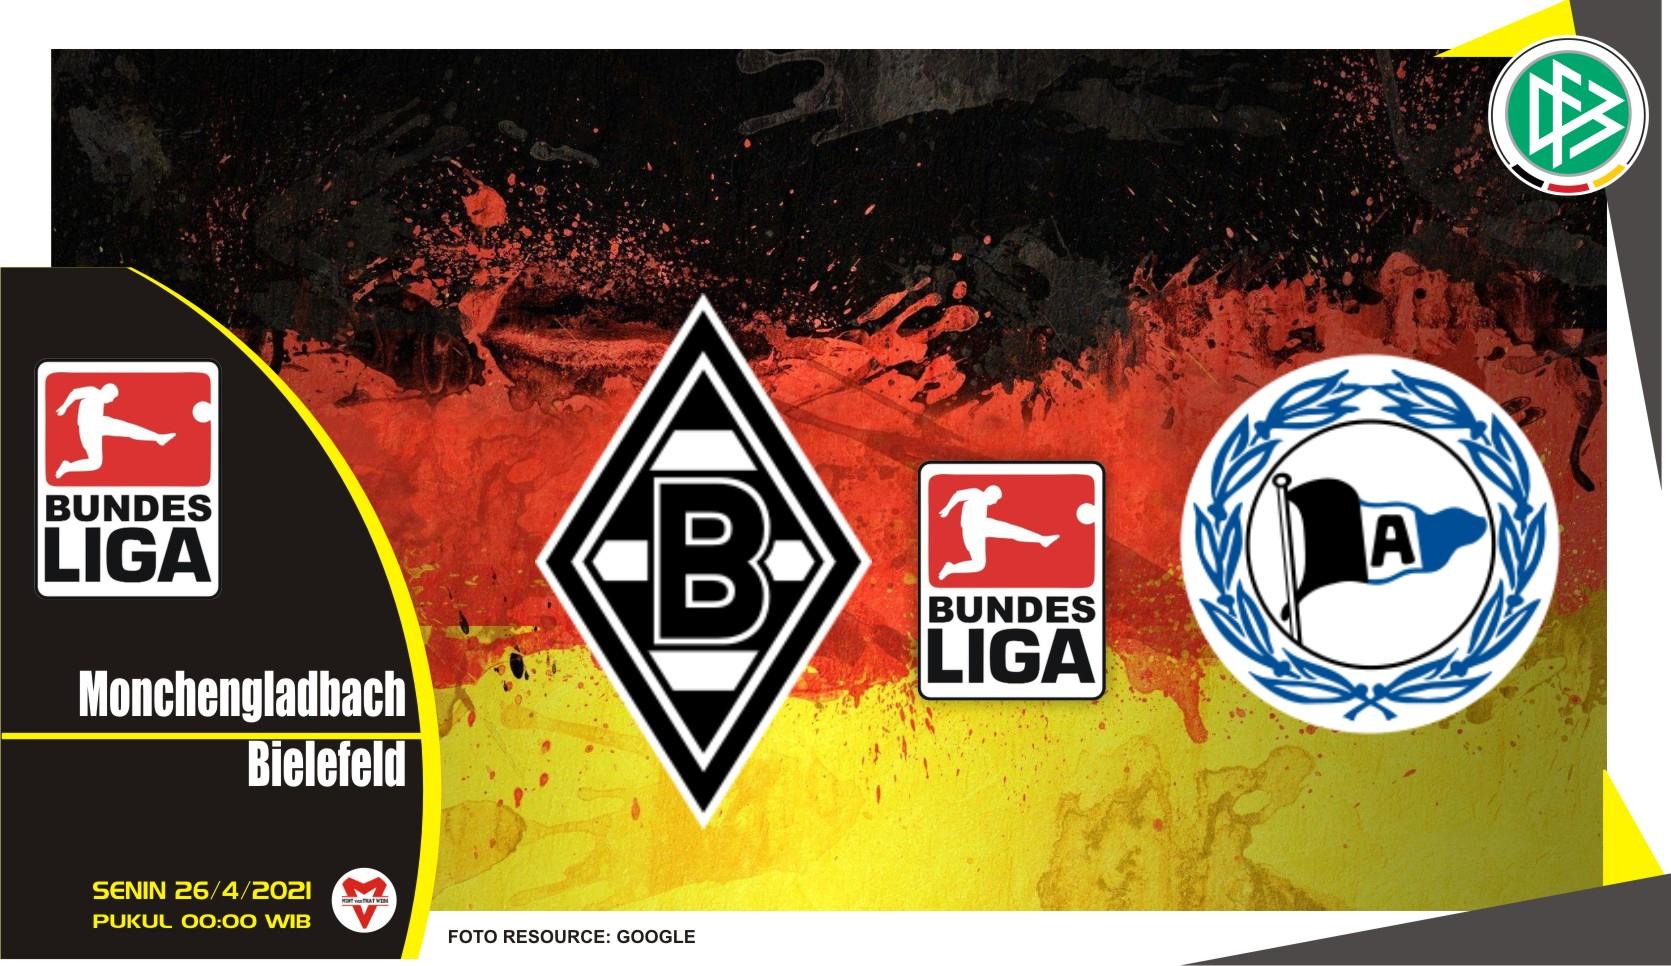 Prediksi Liga Jerman: Monchengladbach vs Arminia Bielefeld - 26 April 2021